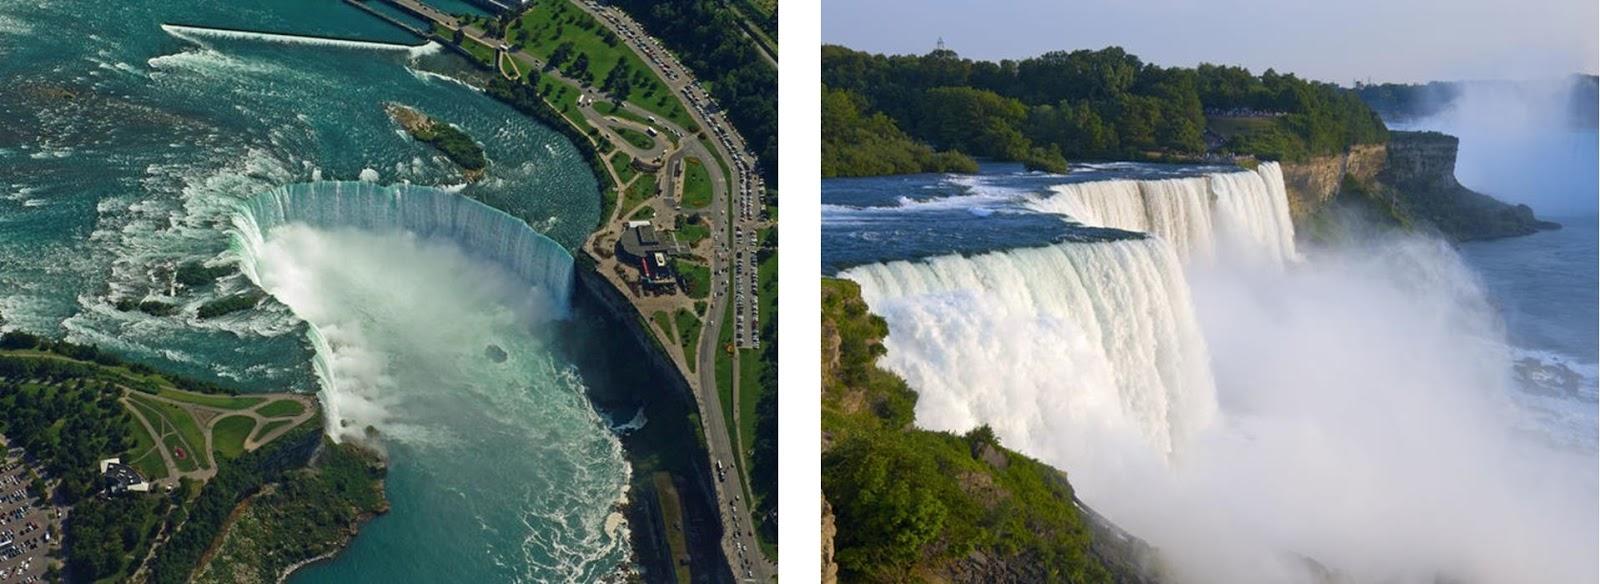 Niagara Falls, United States & Canada